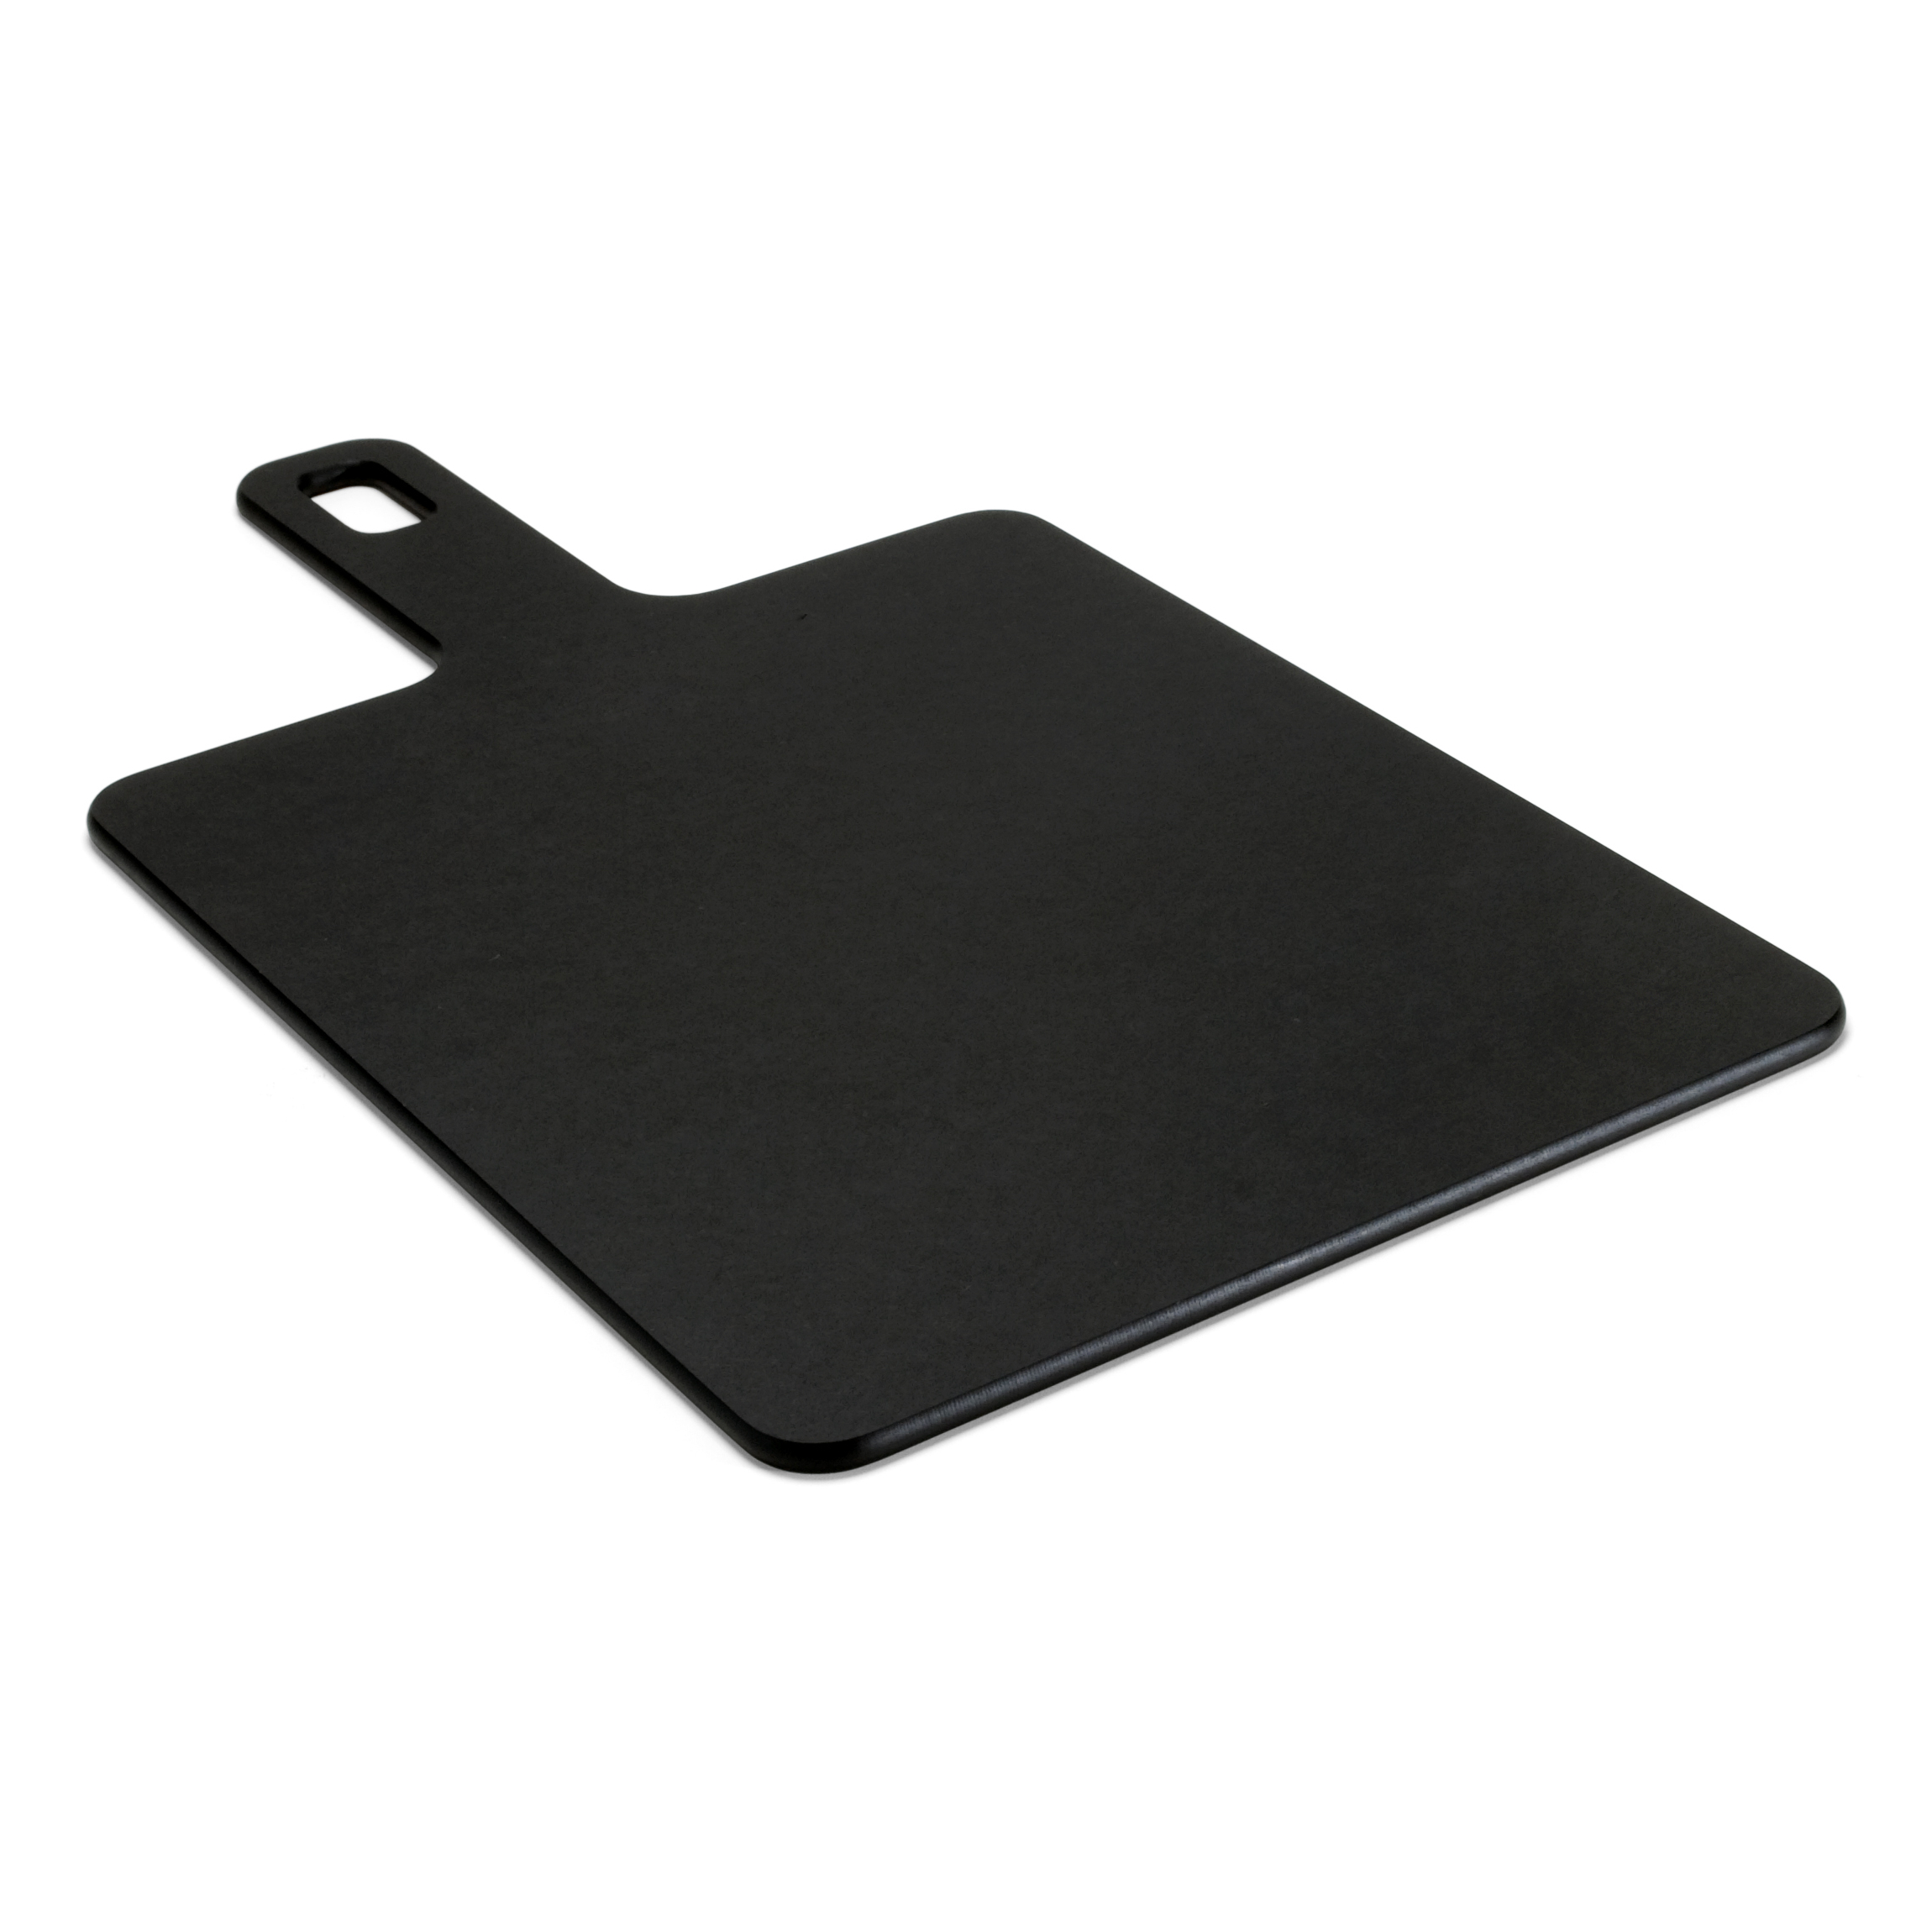 Epicurean Handy Series Slate 9 x 7 Inch Cutting Board